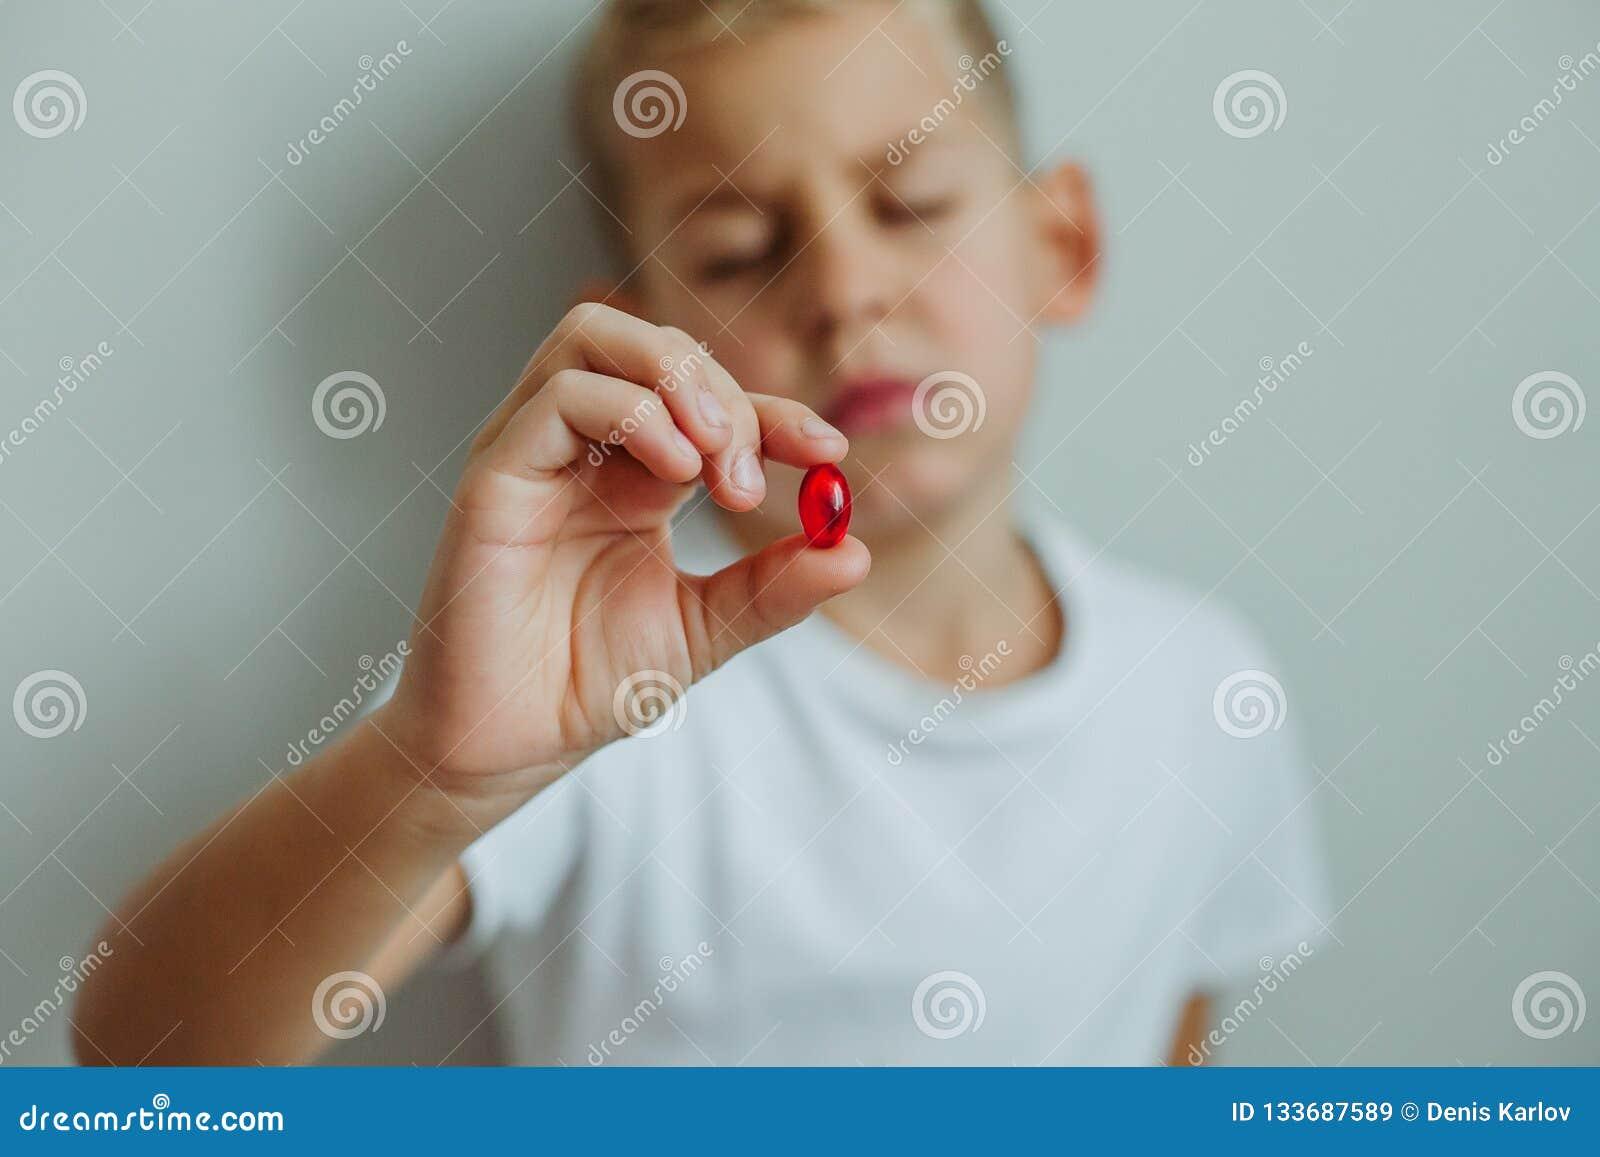 Kinderkrankheit